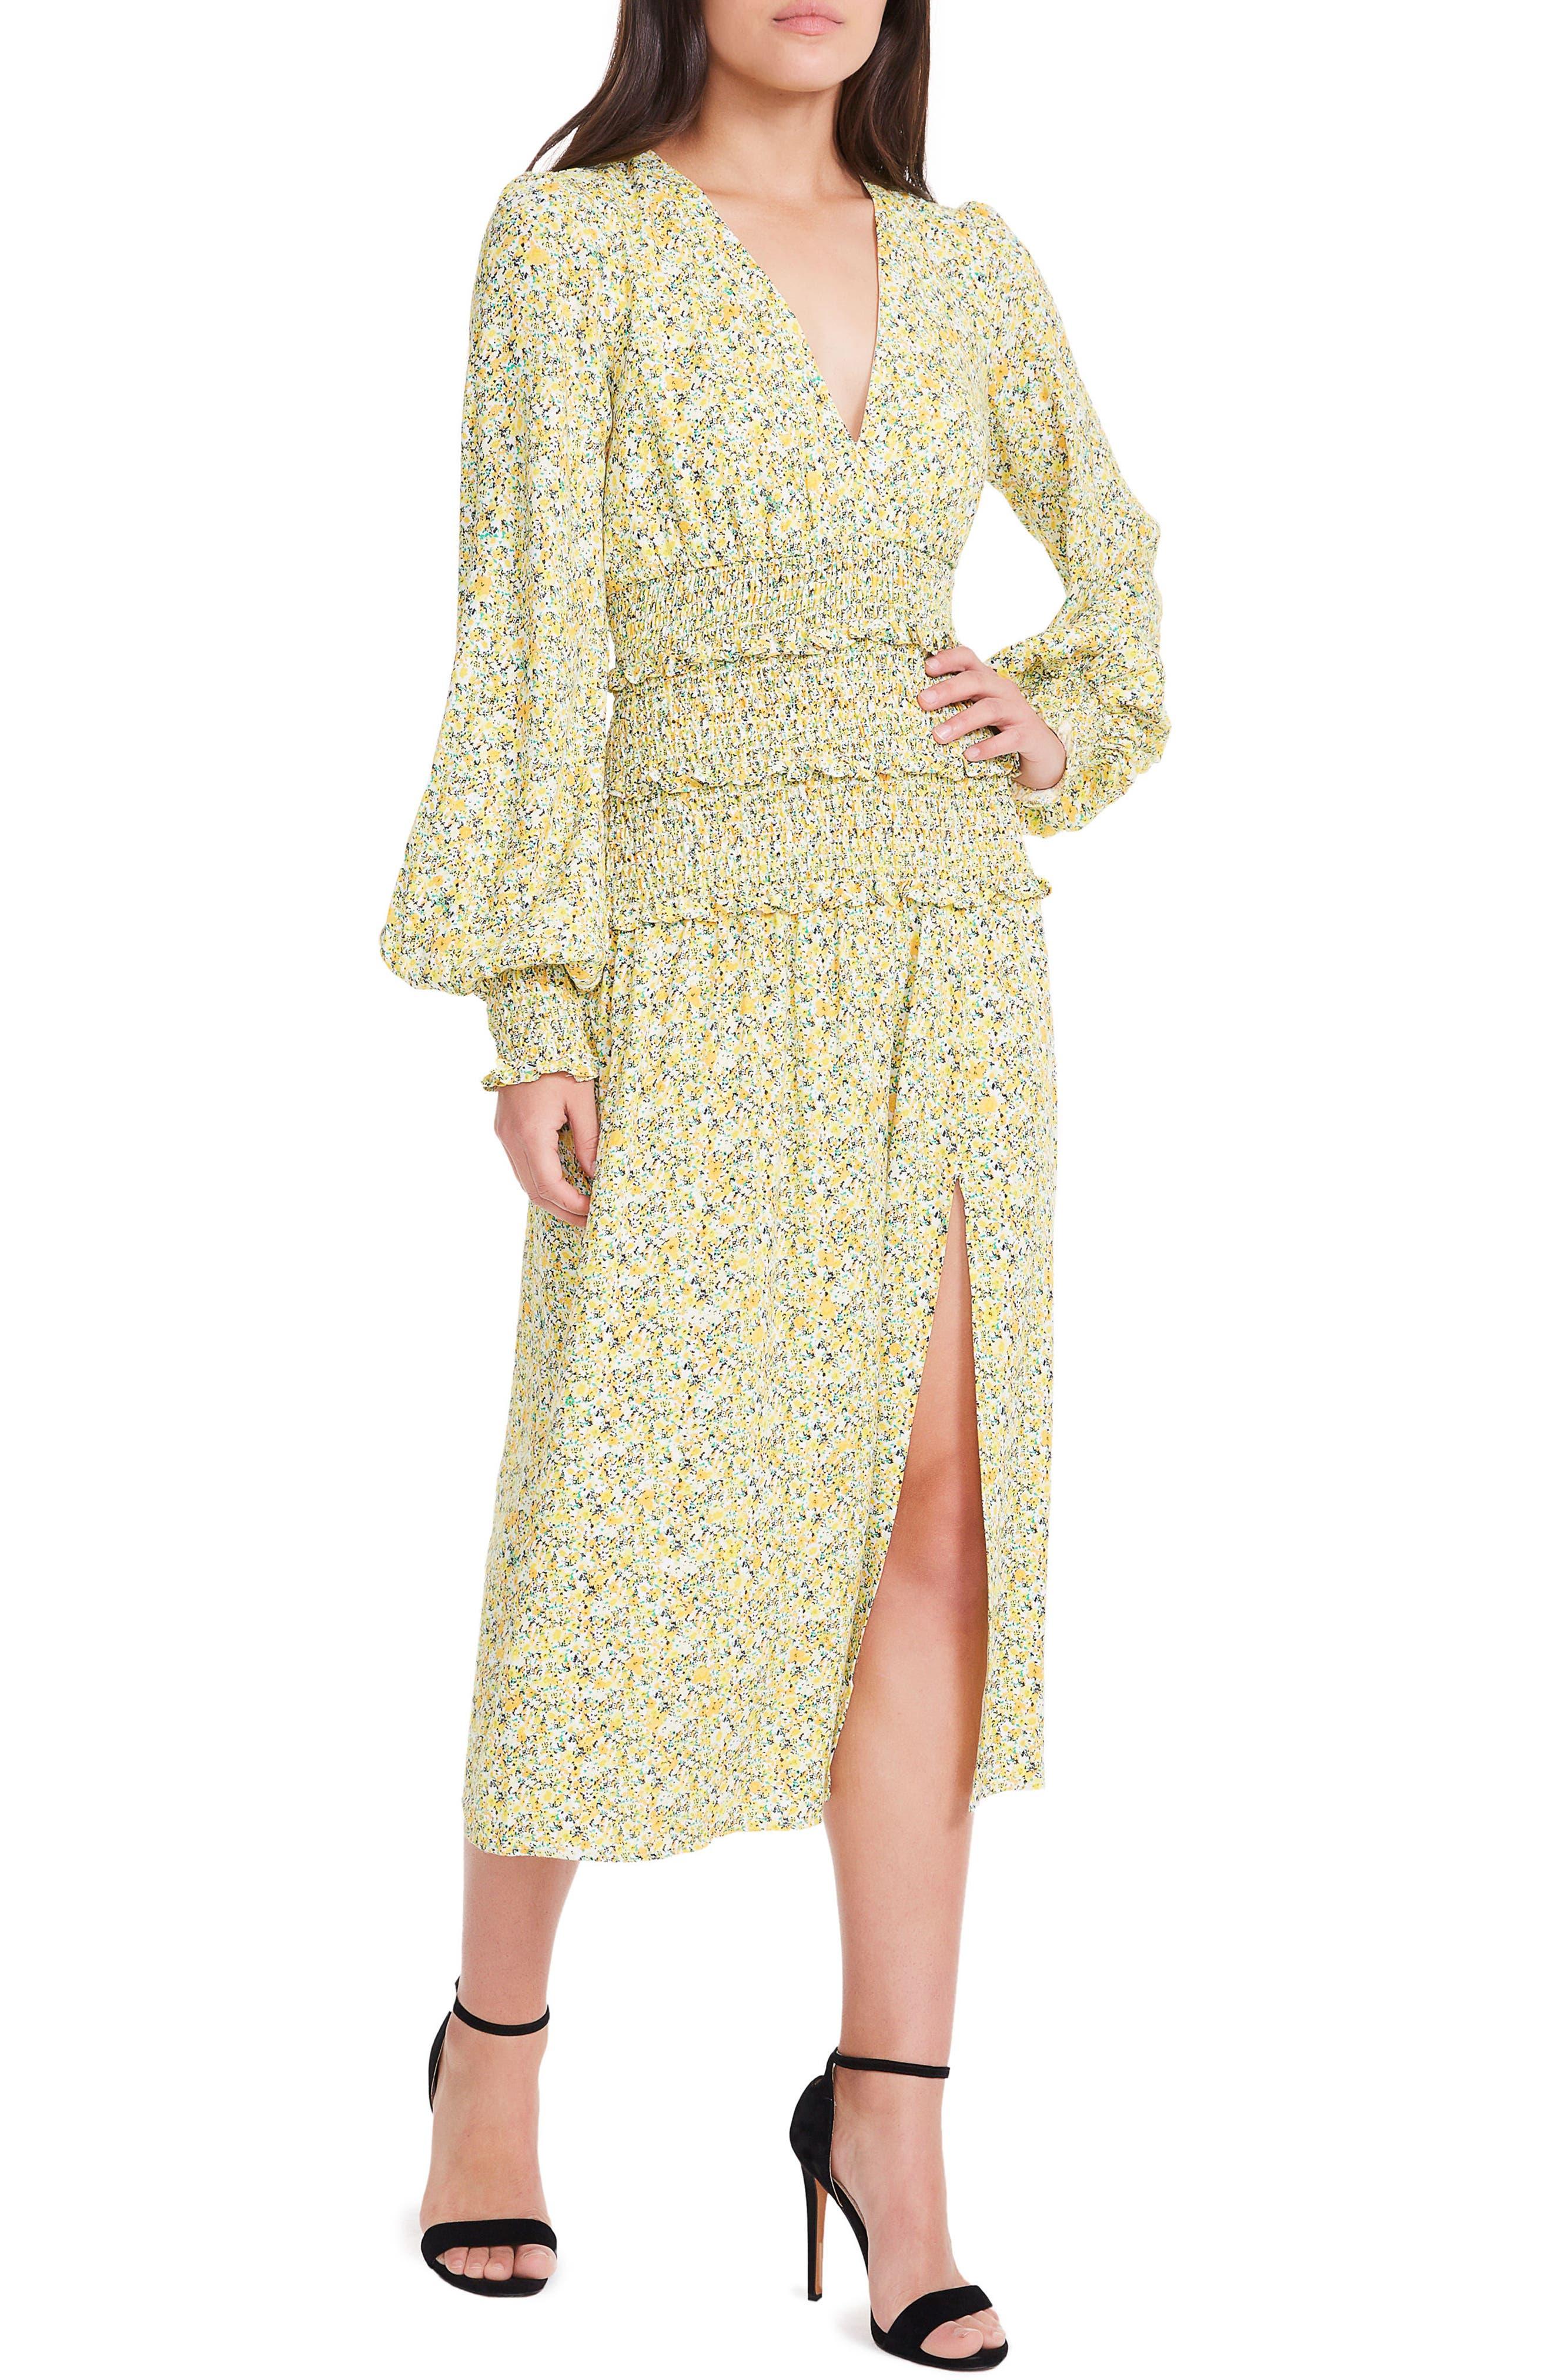 Alternate Image 1 Selected - AFRM Hazel Smocked Midi Dress